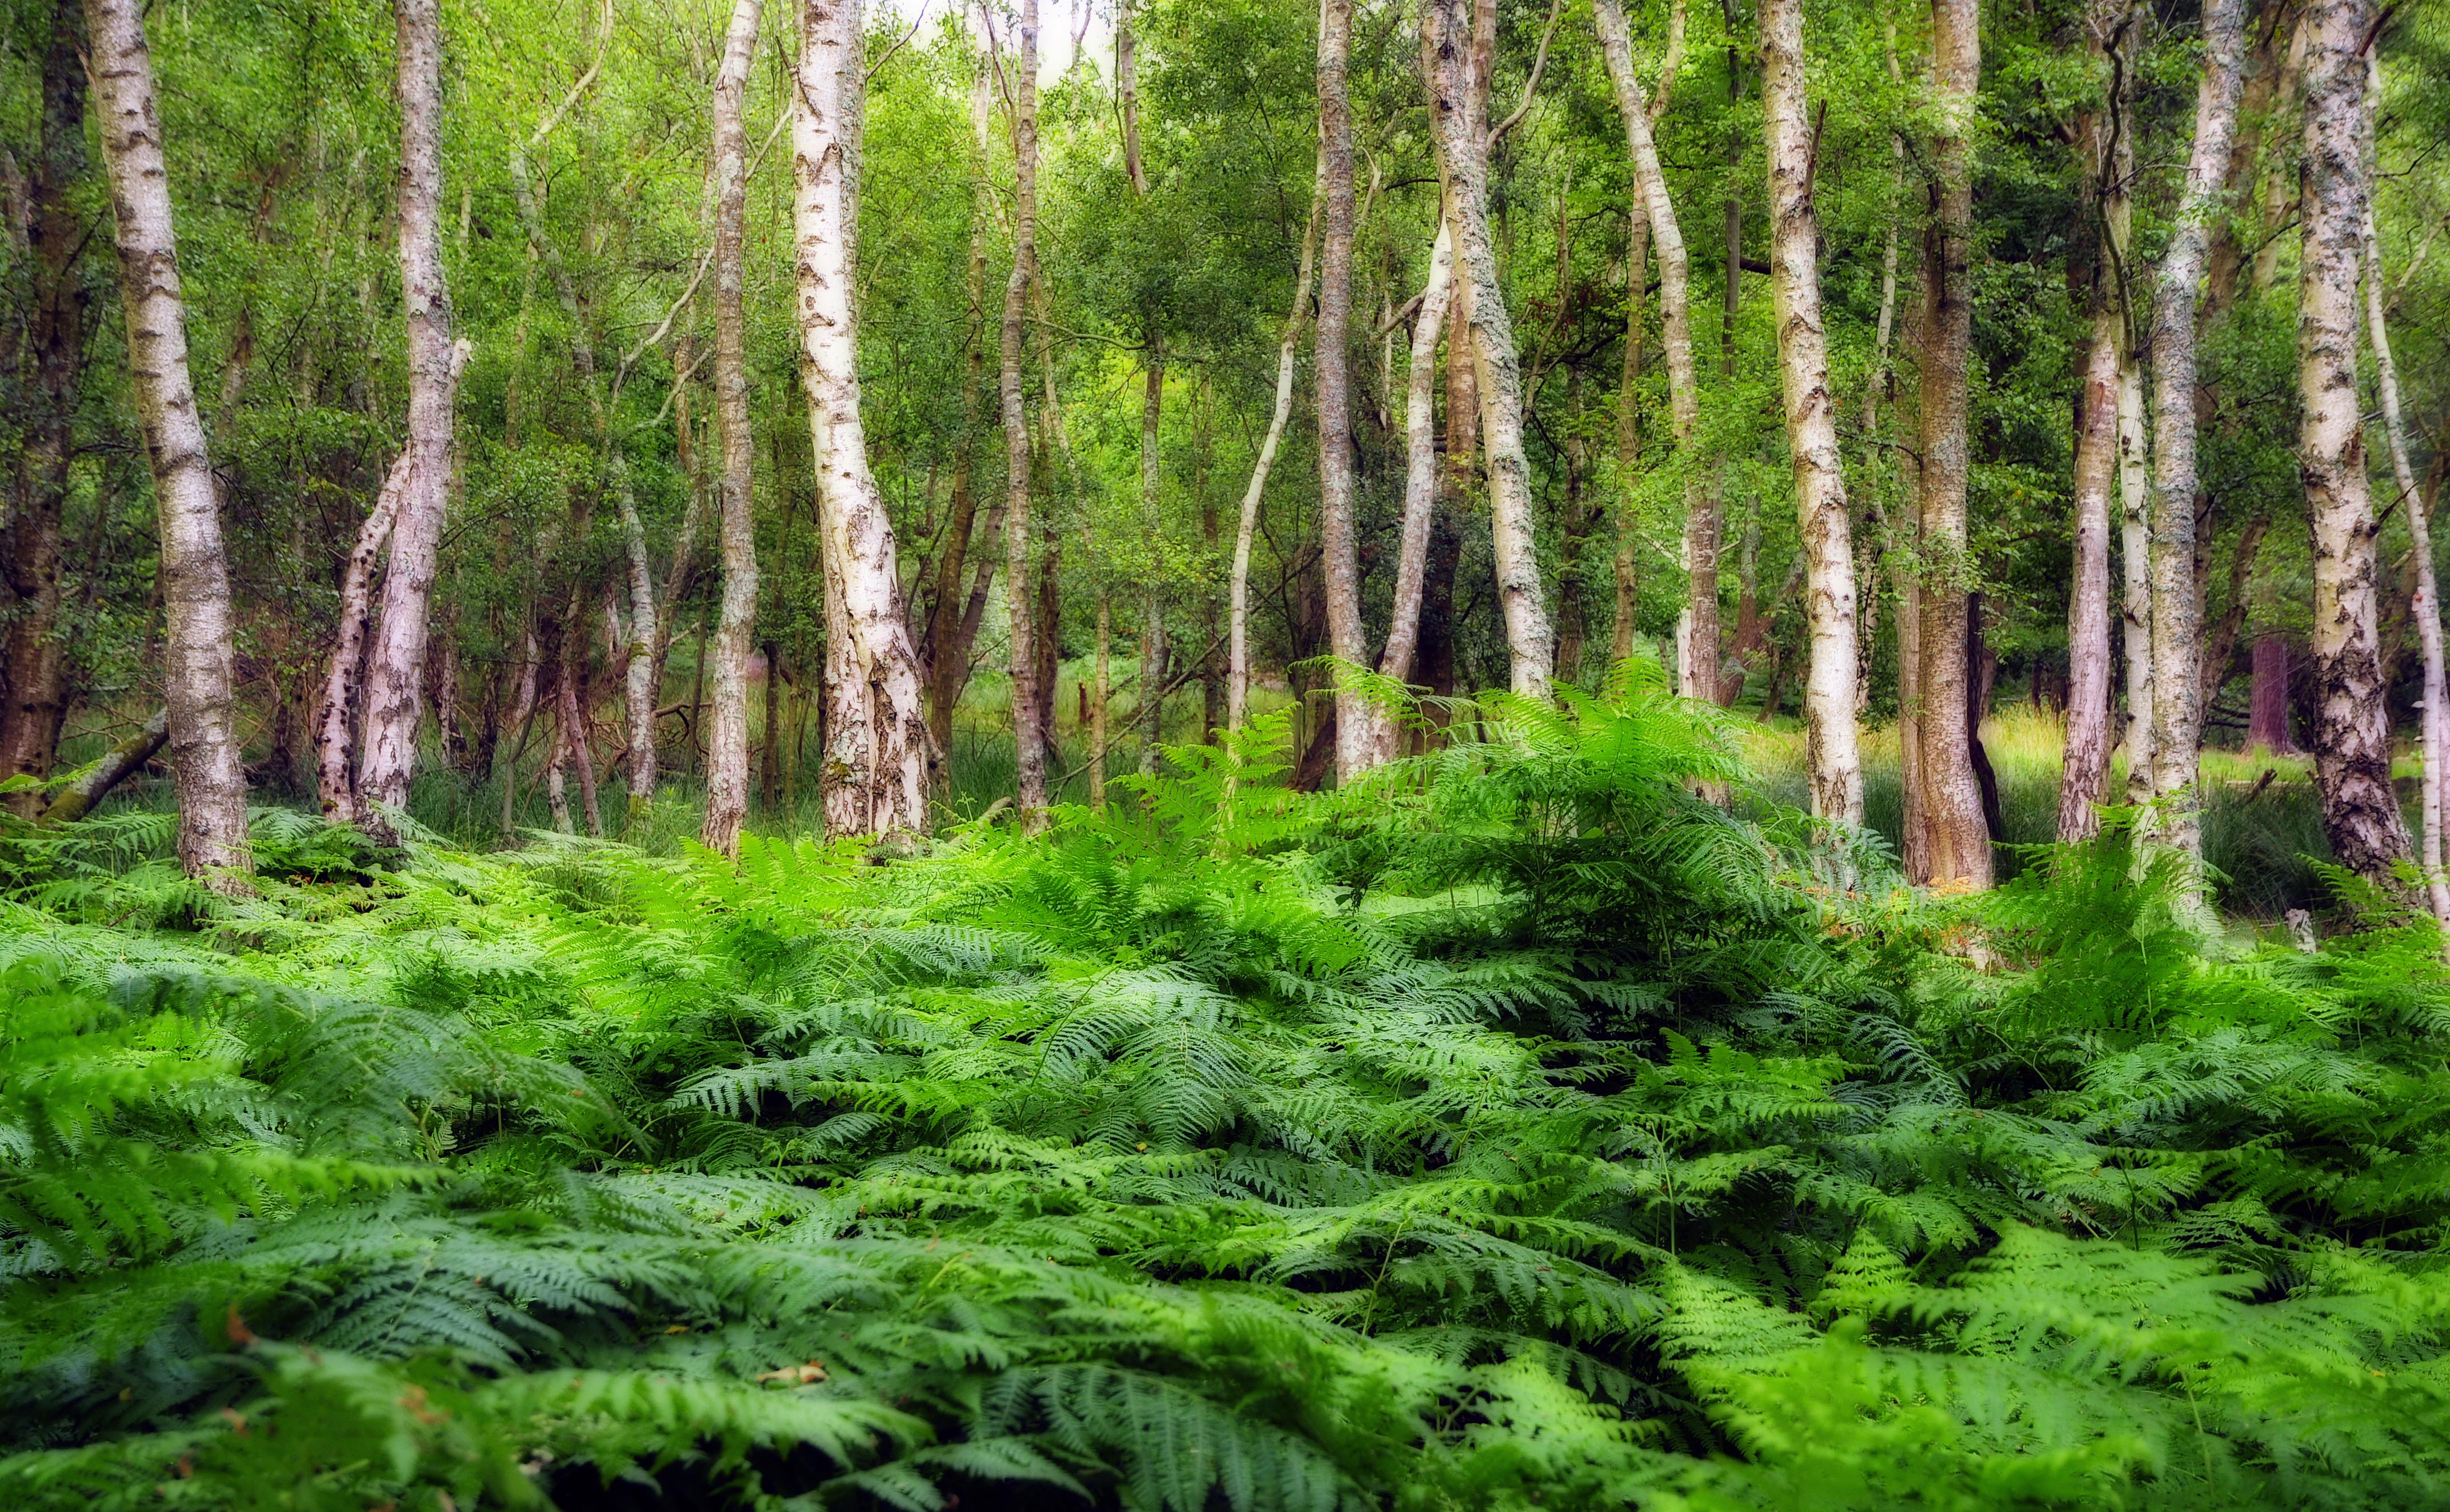 England - Arne Nature Reserve